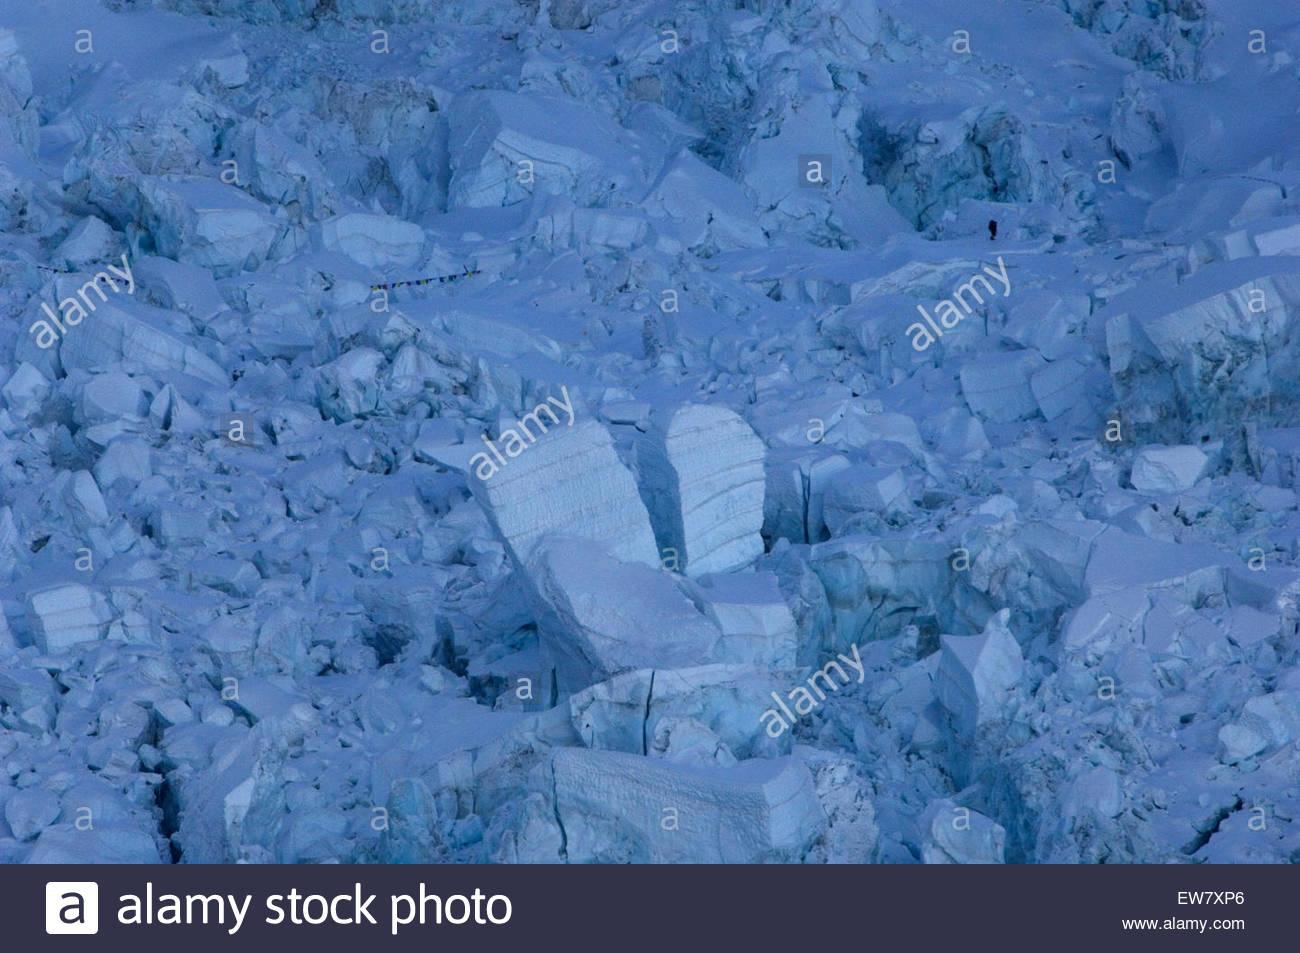 A climber negotiates Everest's Khumbu Icefall, Nepal. - Stock Image